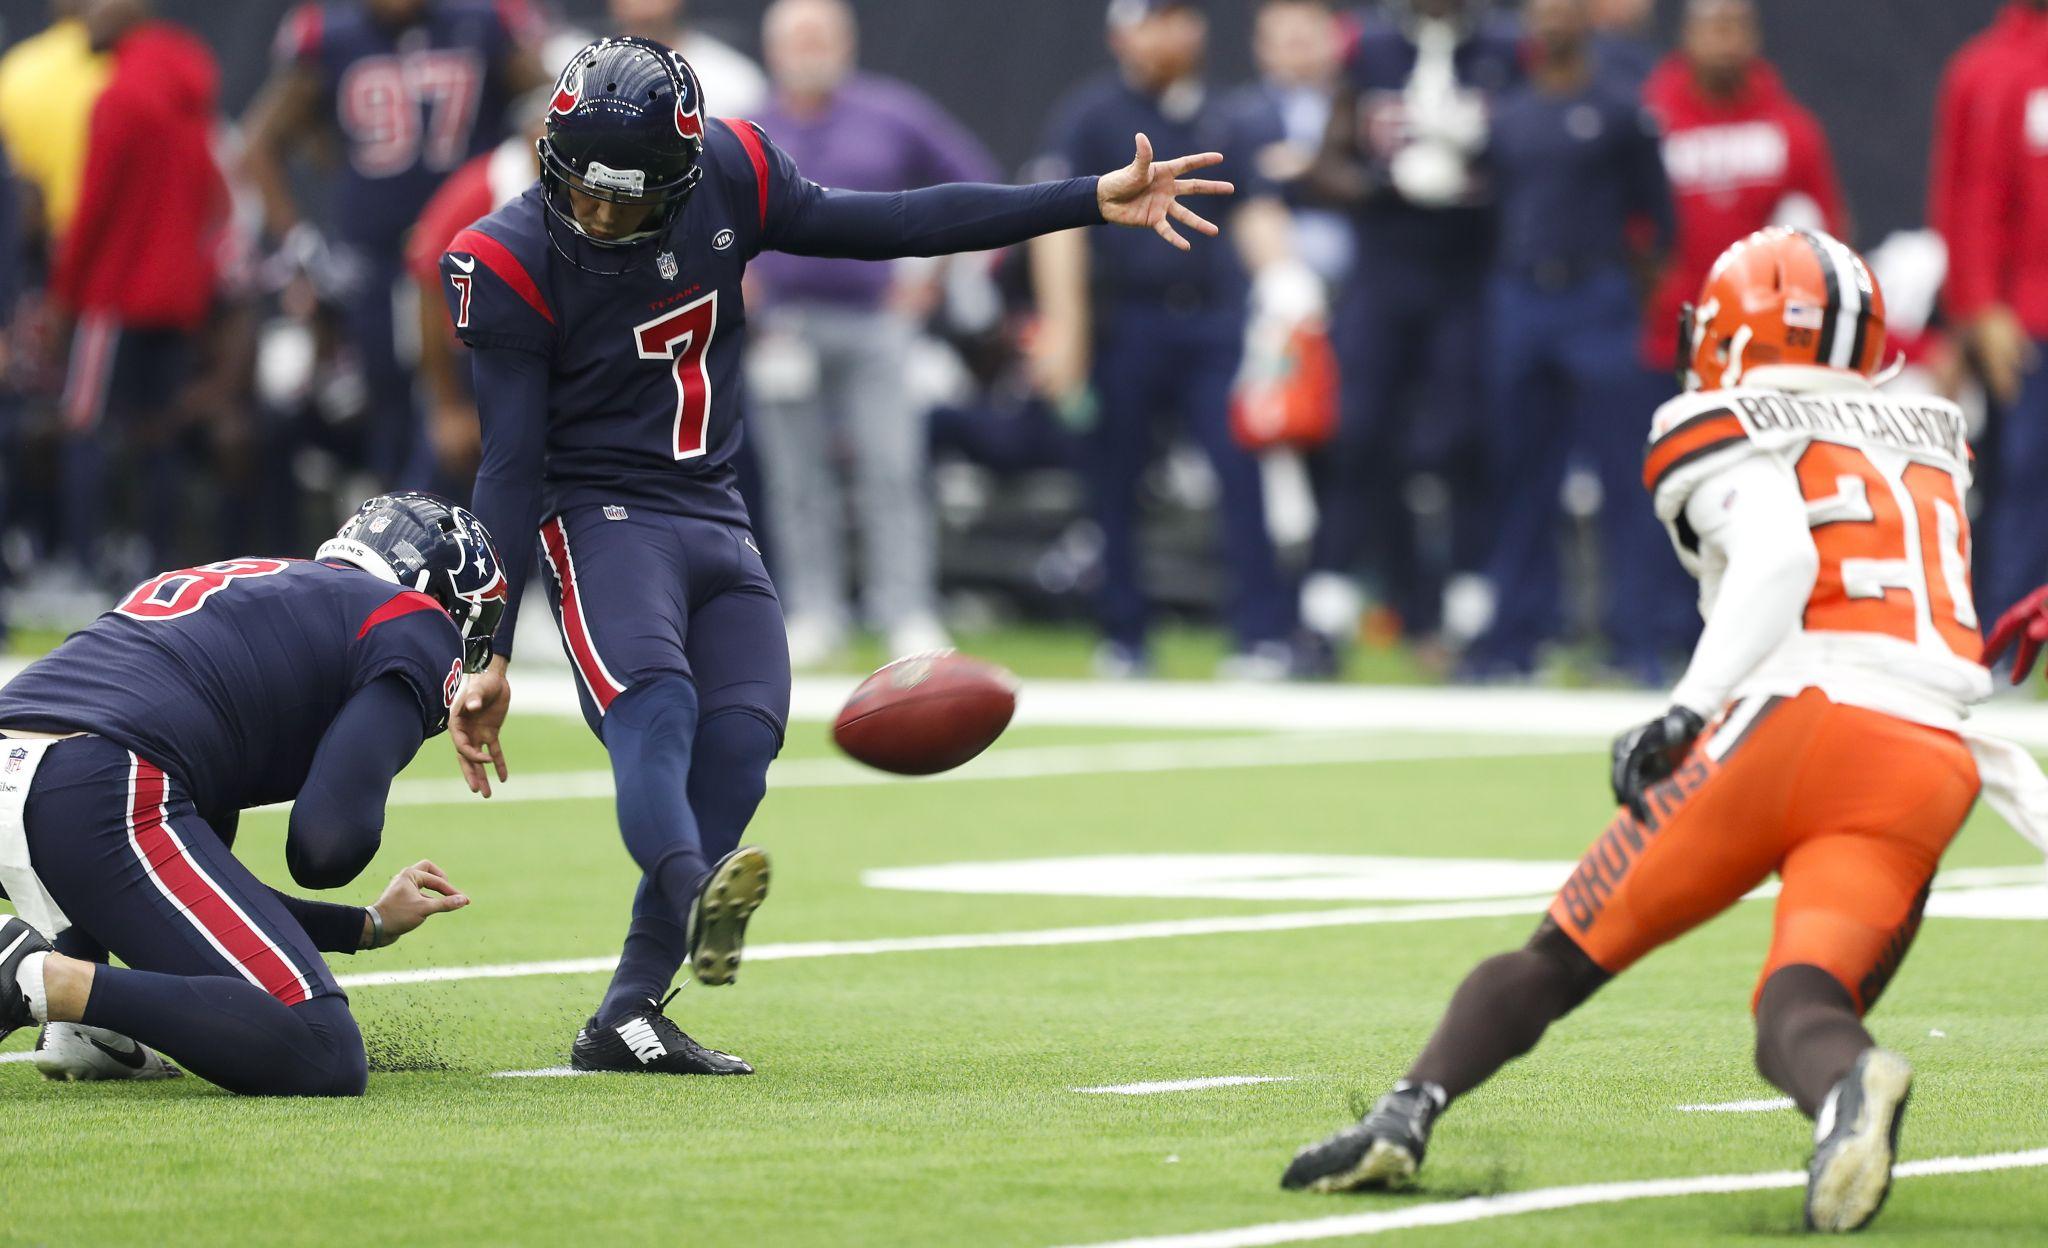 Texans kicker Ka'imi Fairbairn continues to grow, eyes future